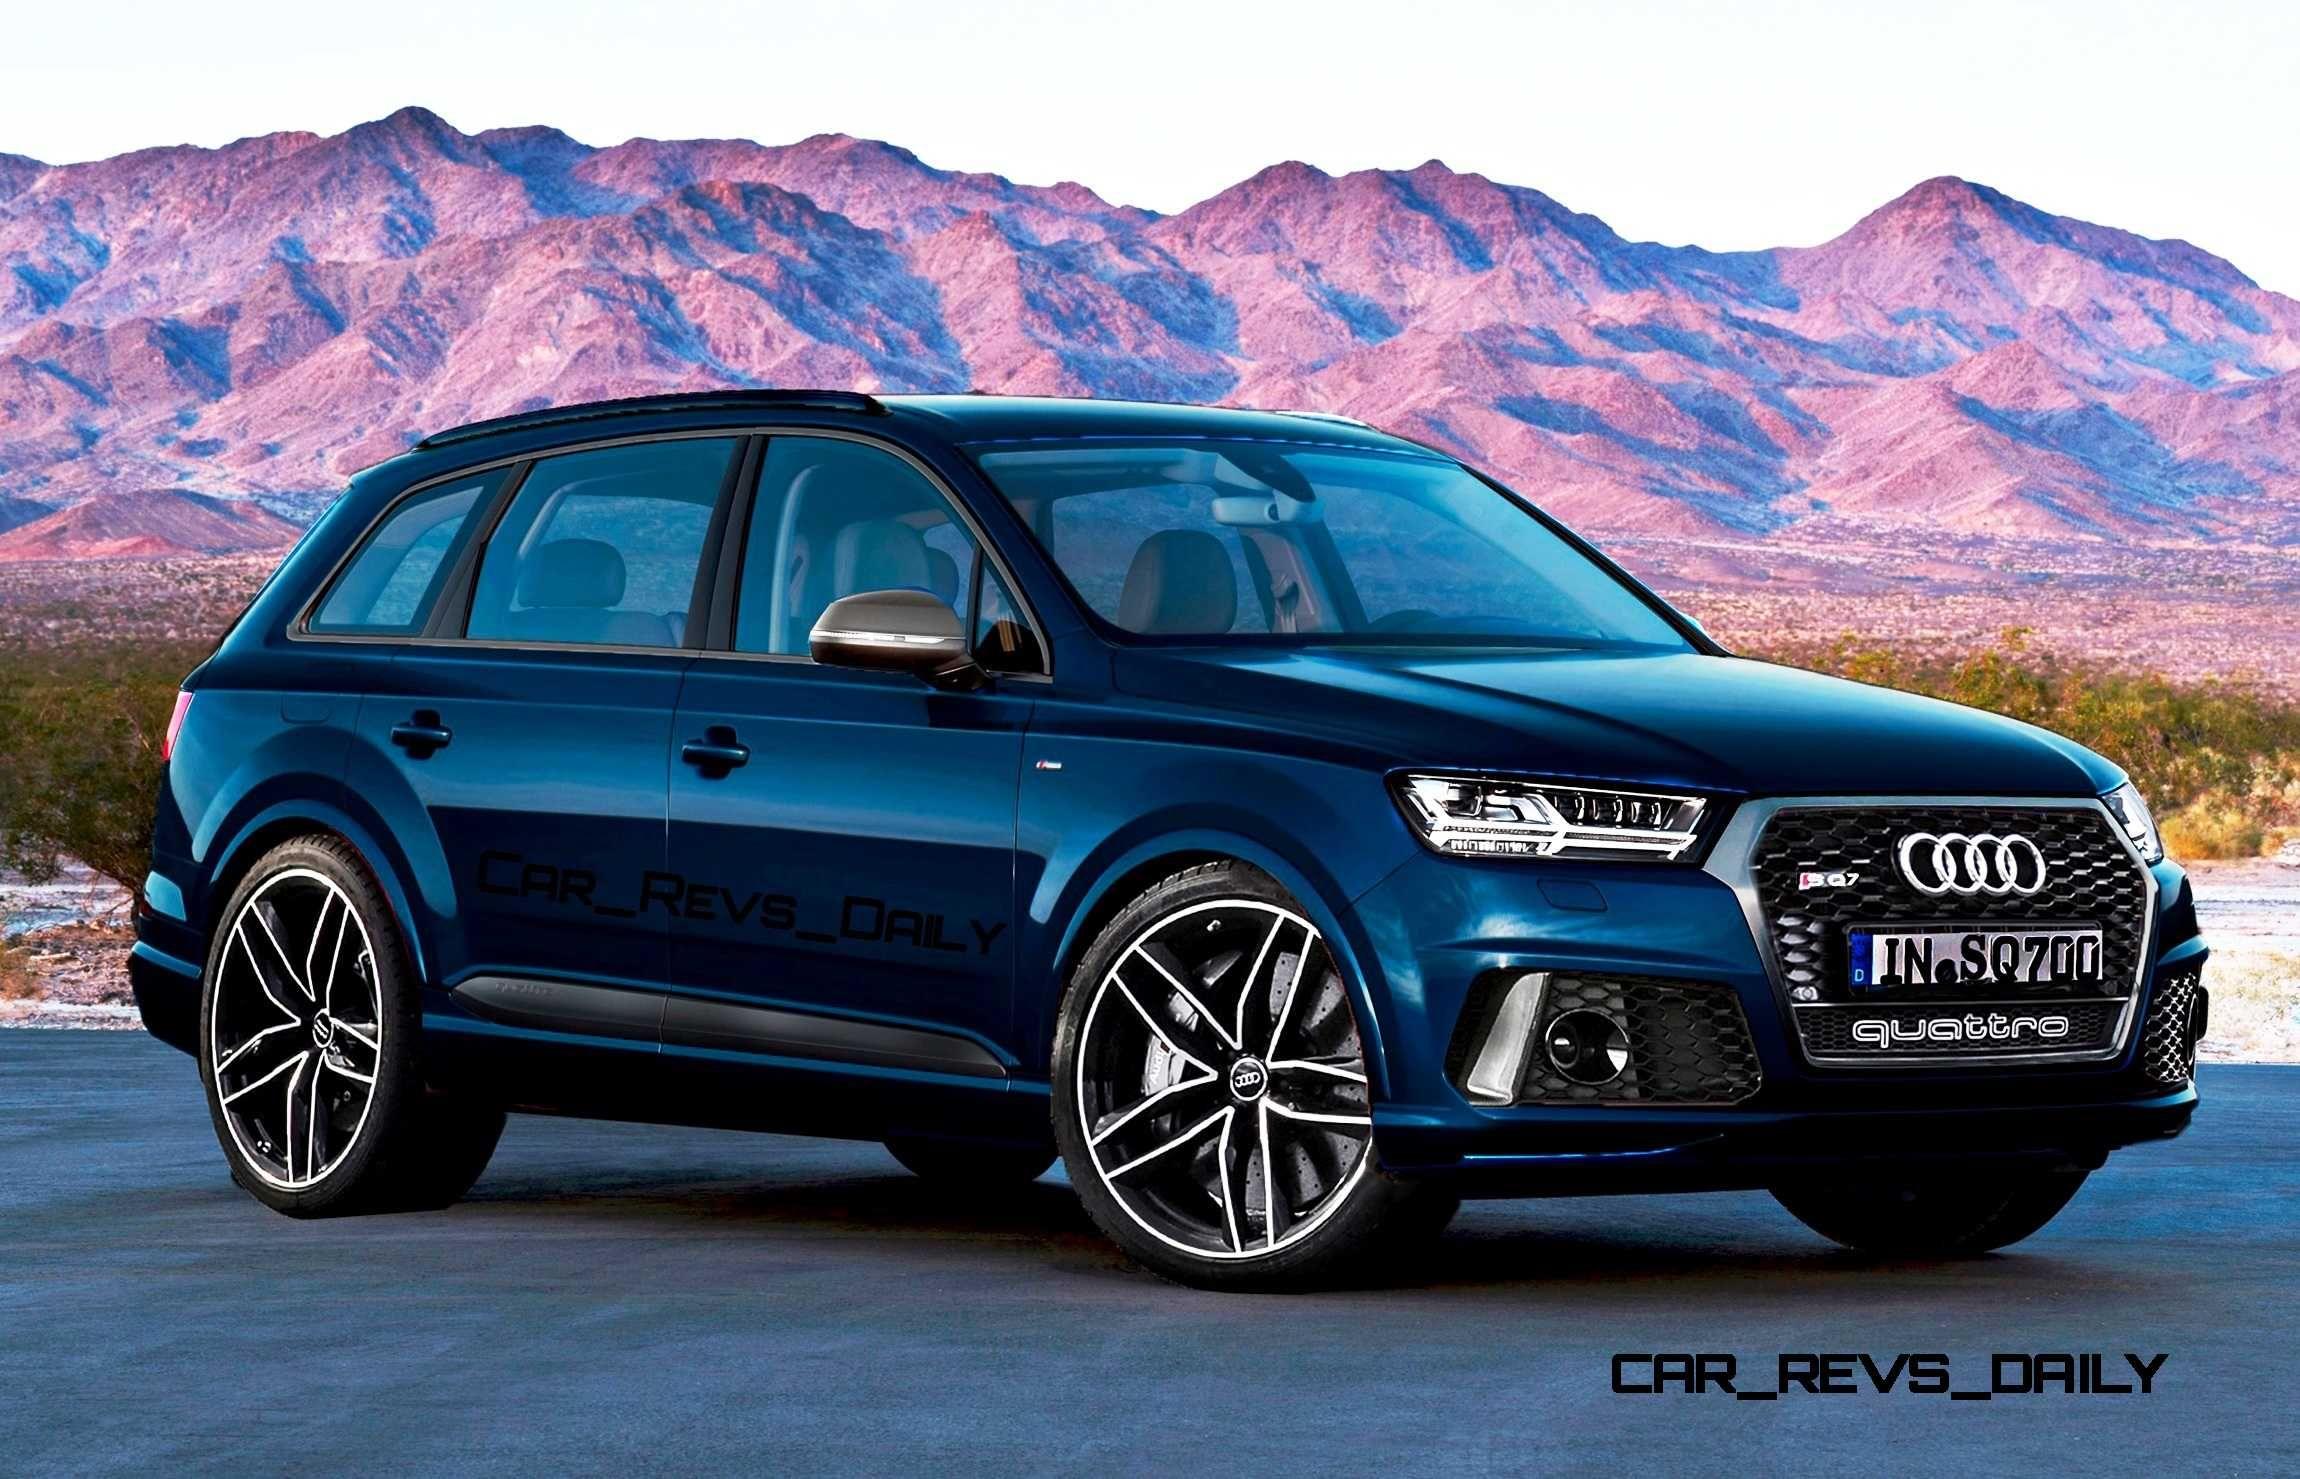 Future Suv Renderings 2016 Audi Rs Q7 8